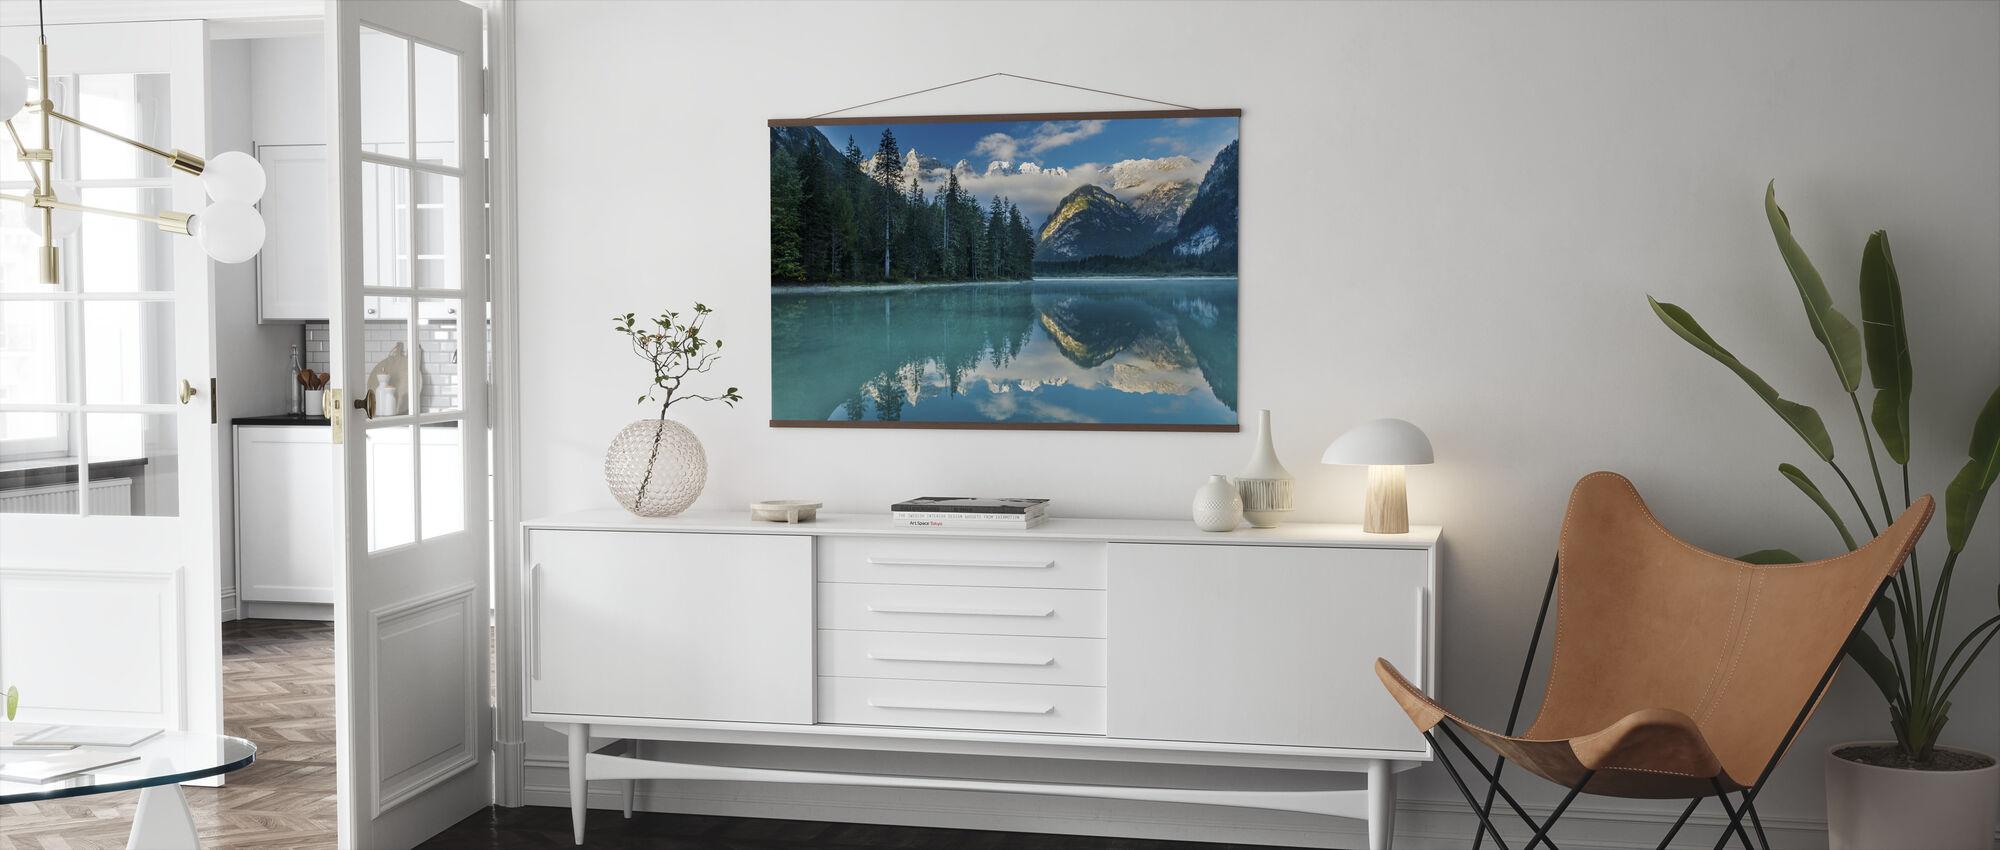 Lake Landro - Poster - Living Room